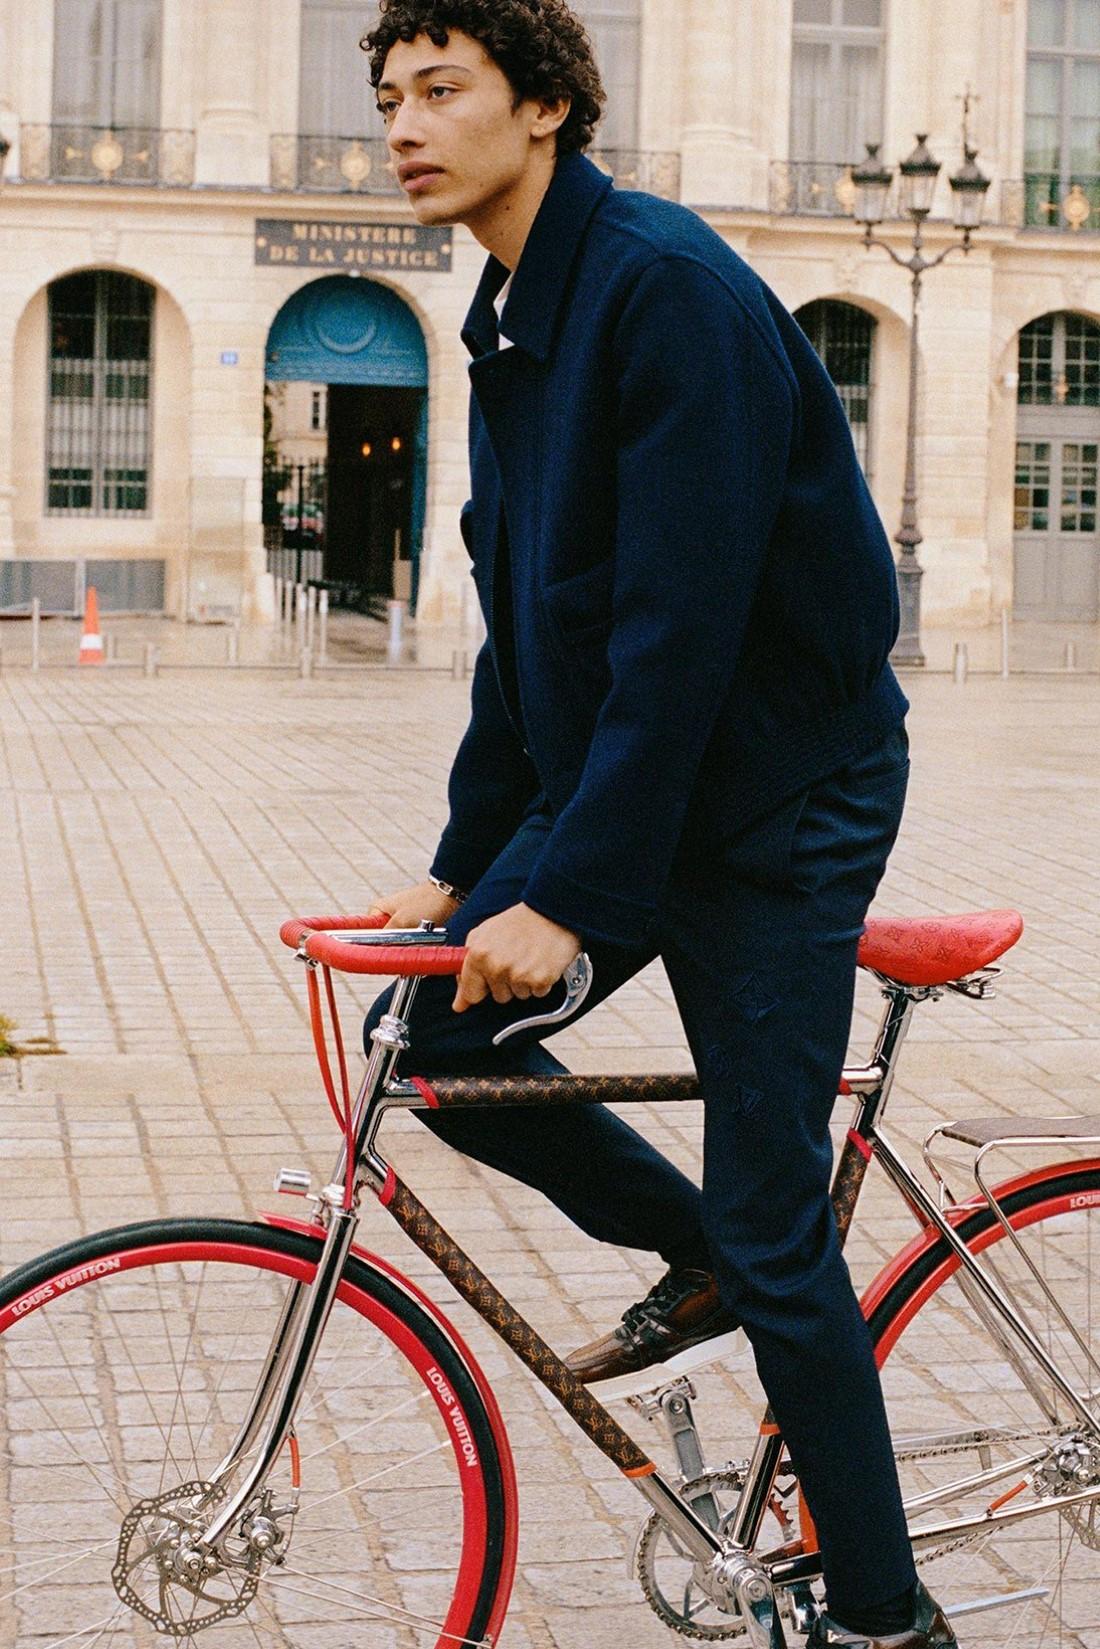 Louis Vuitton x Maison Tamboite